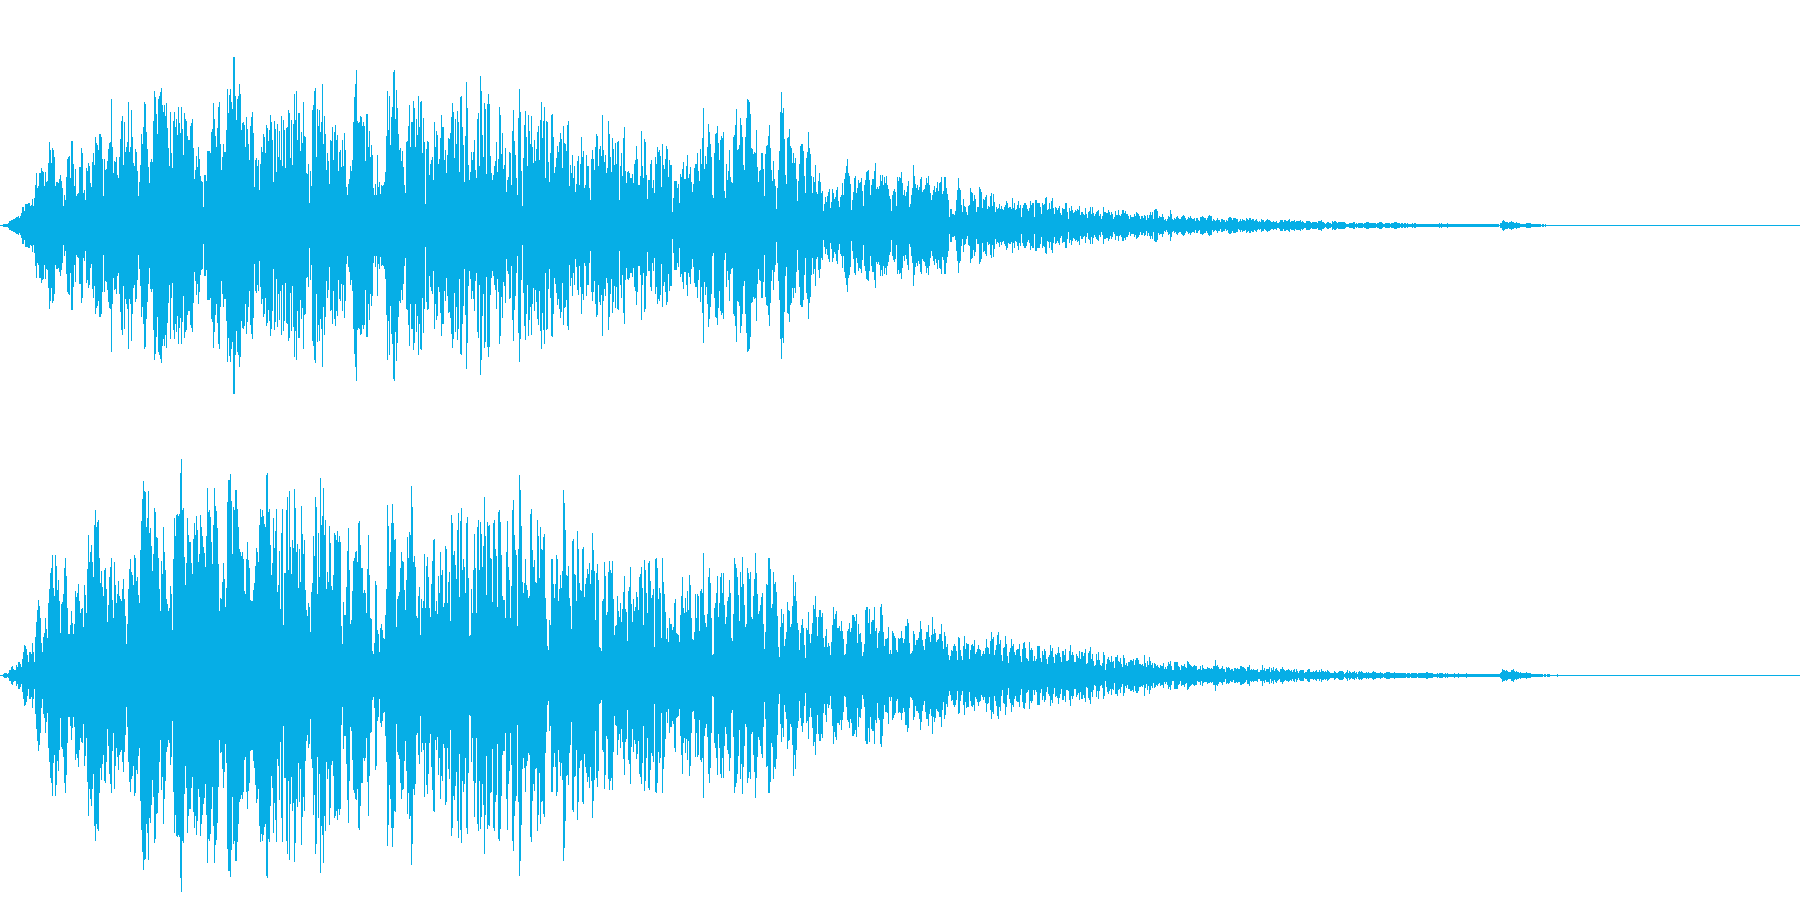 CINEMATIC DARK SFX2の再生済みの波形